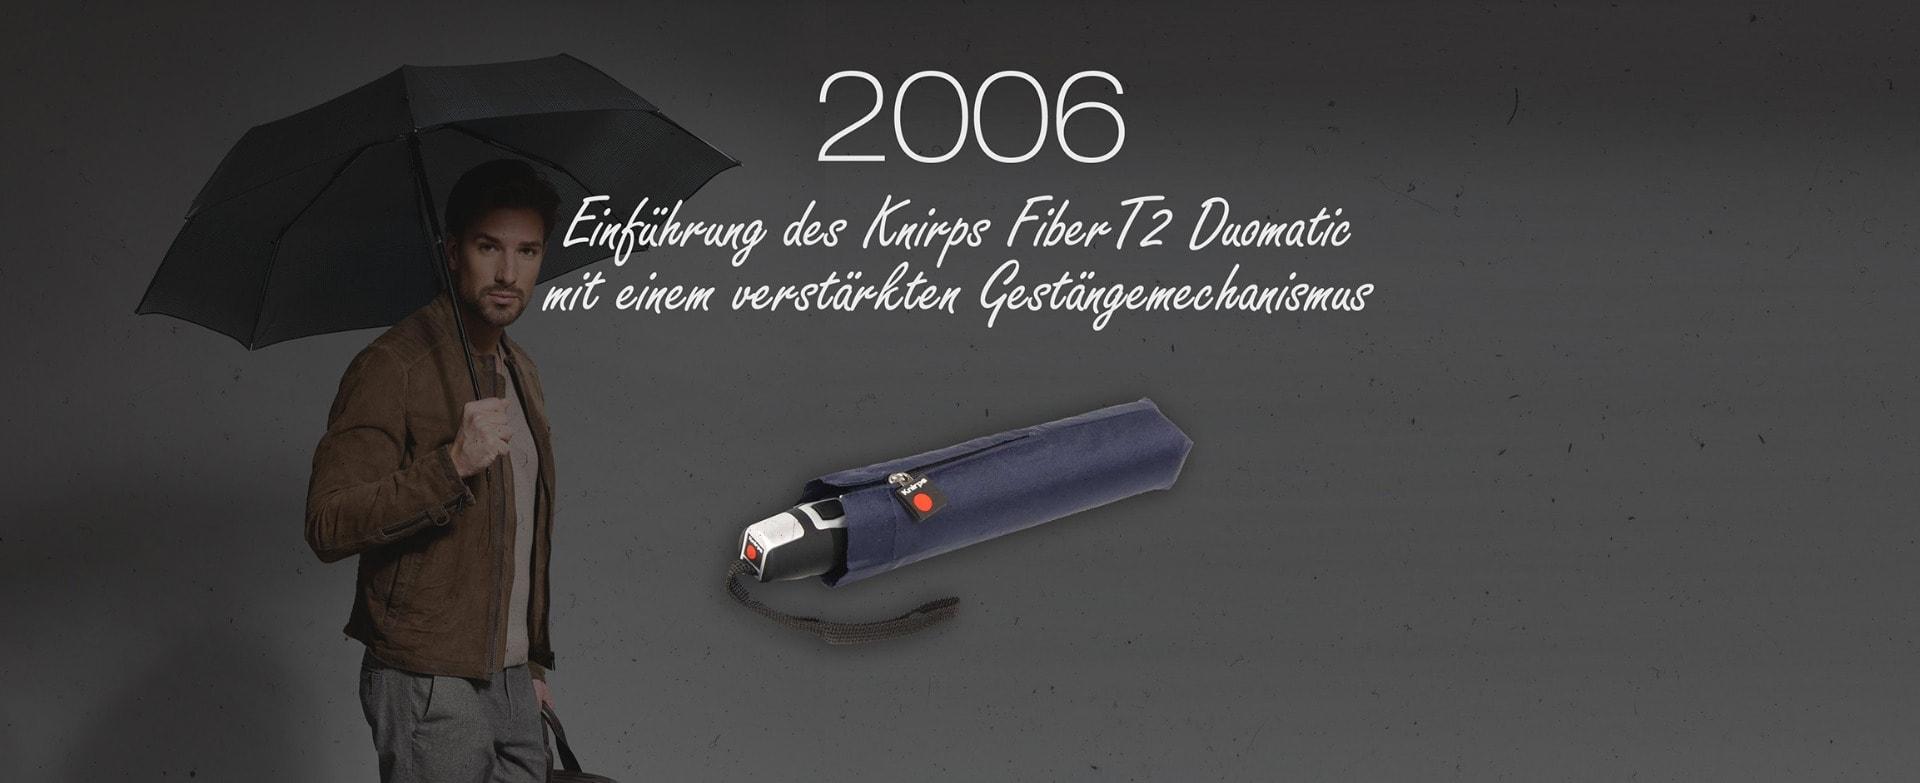 2006-Knirps-Einfuehrung-des-Fiber-T2-Duomatic